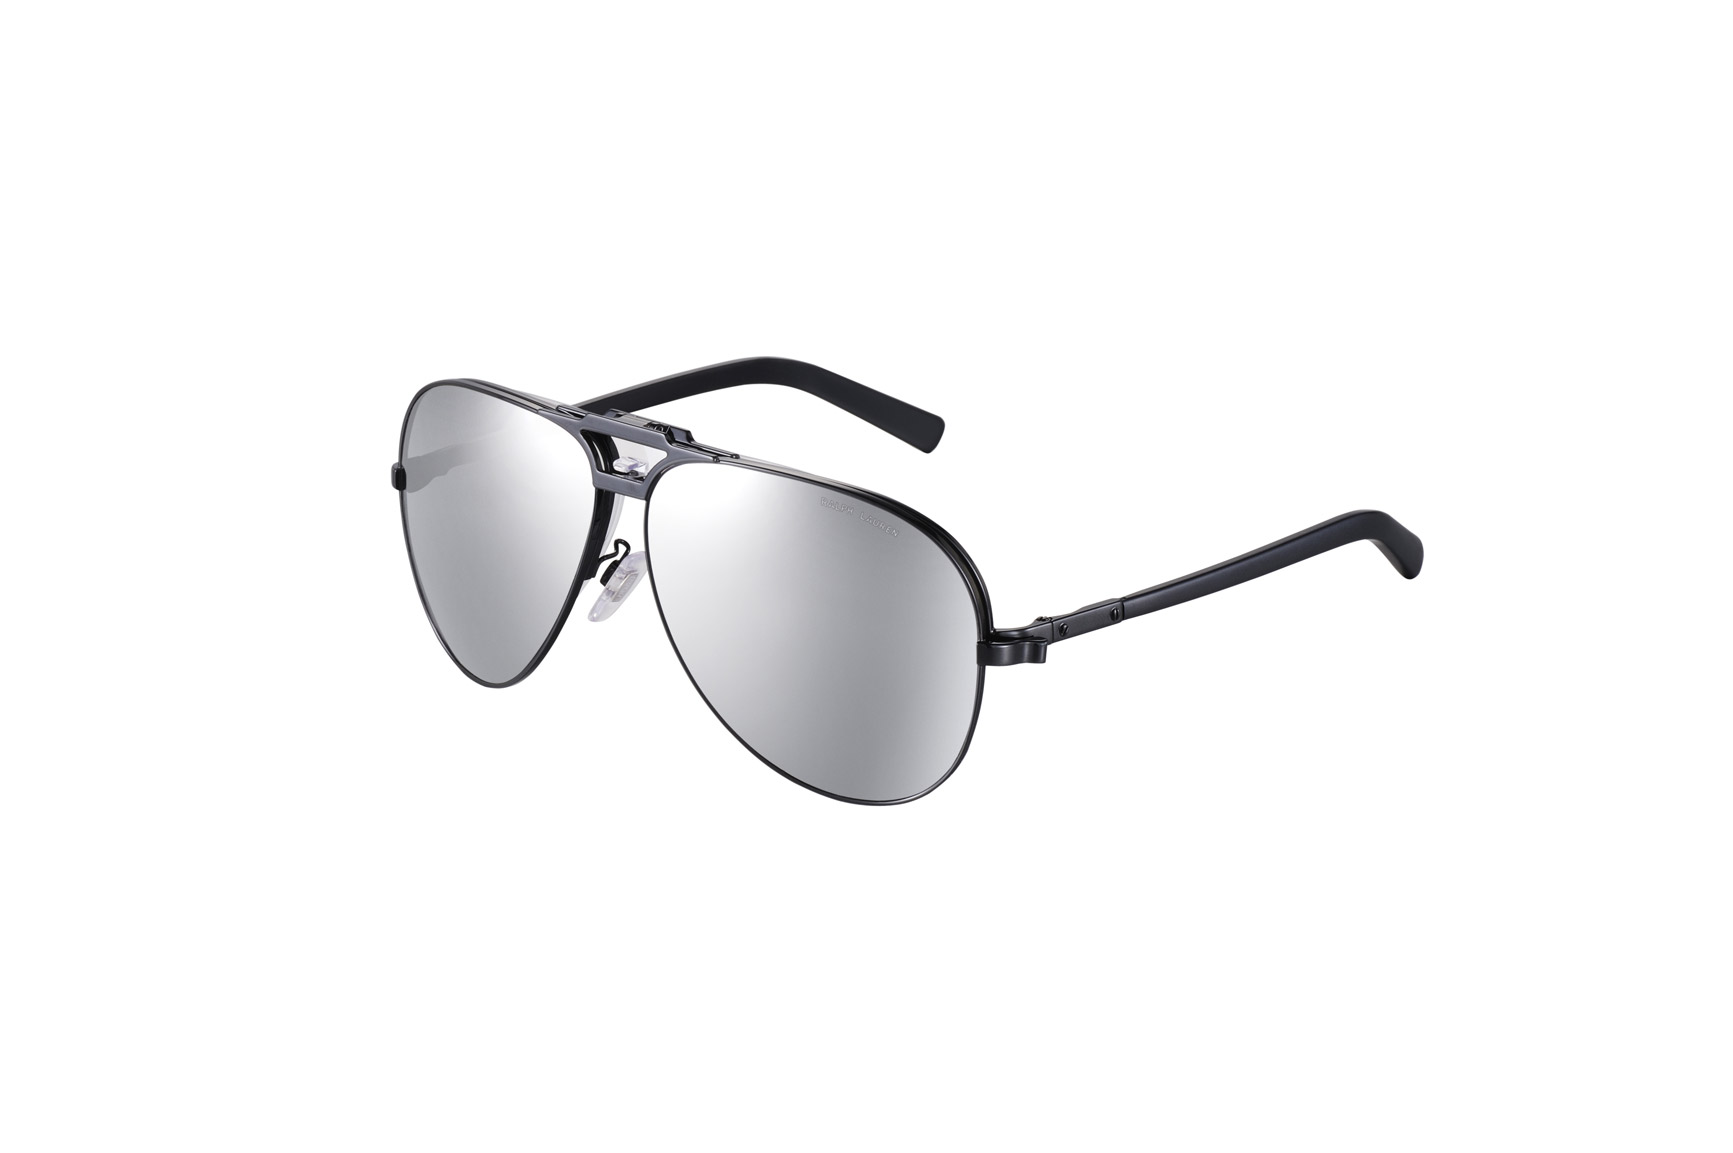 Ralph Lauren Eyeglasses Pearle Vision